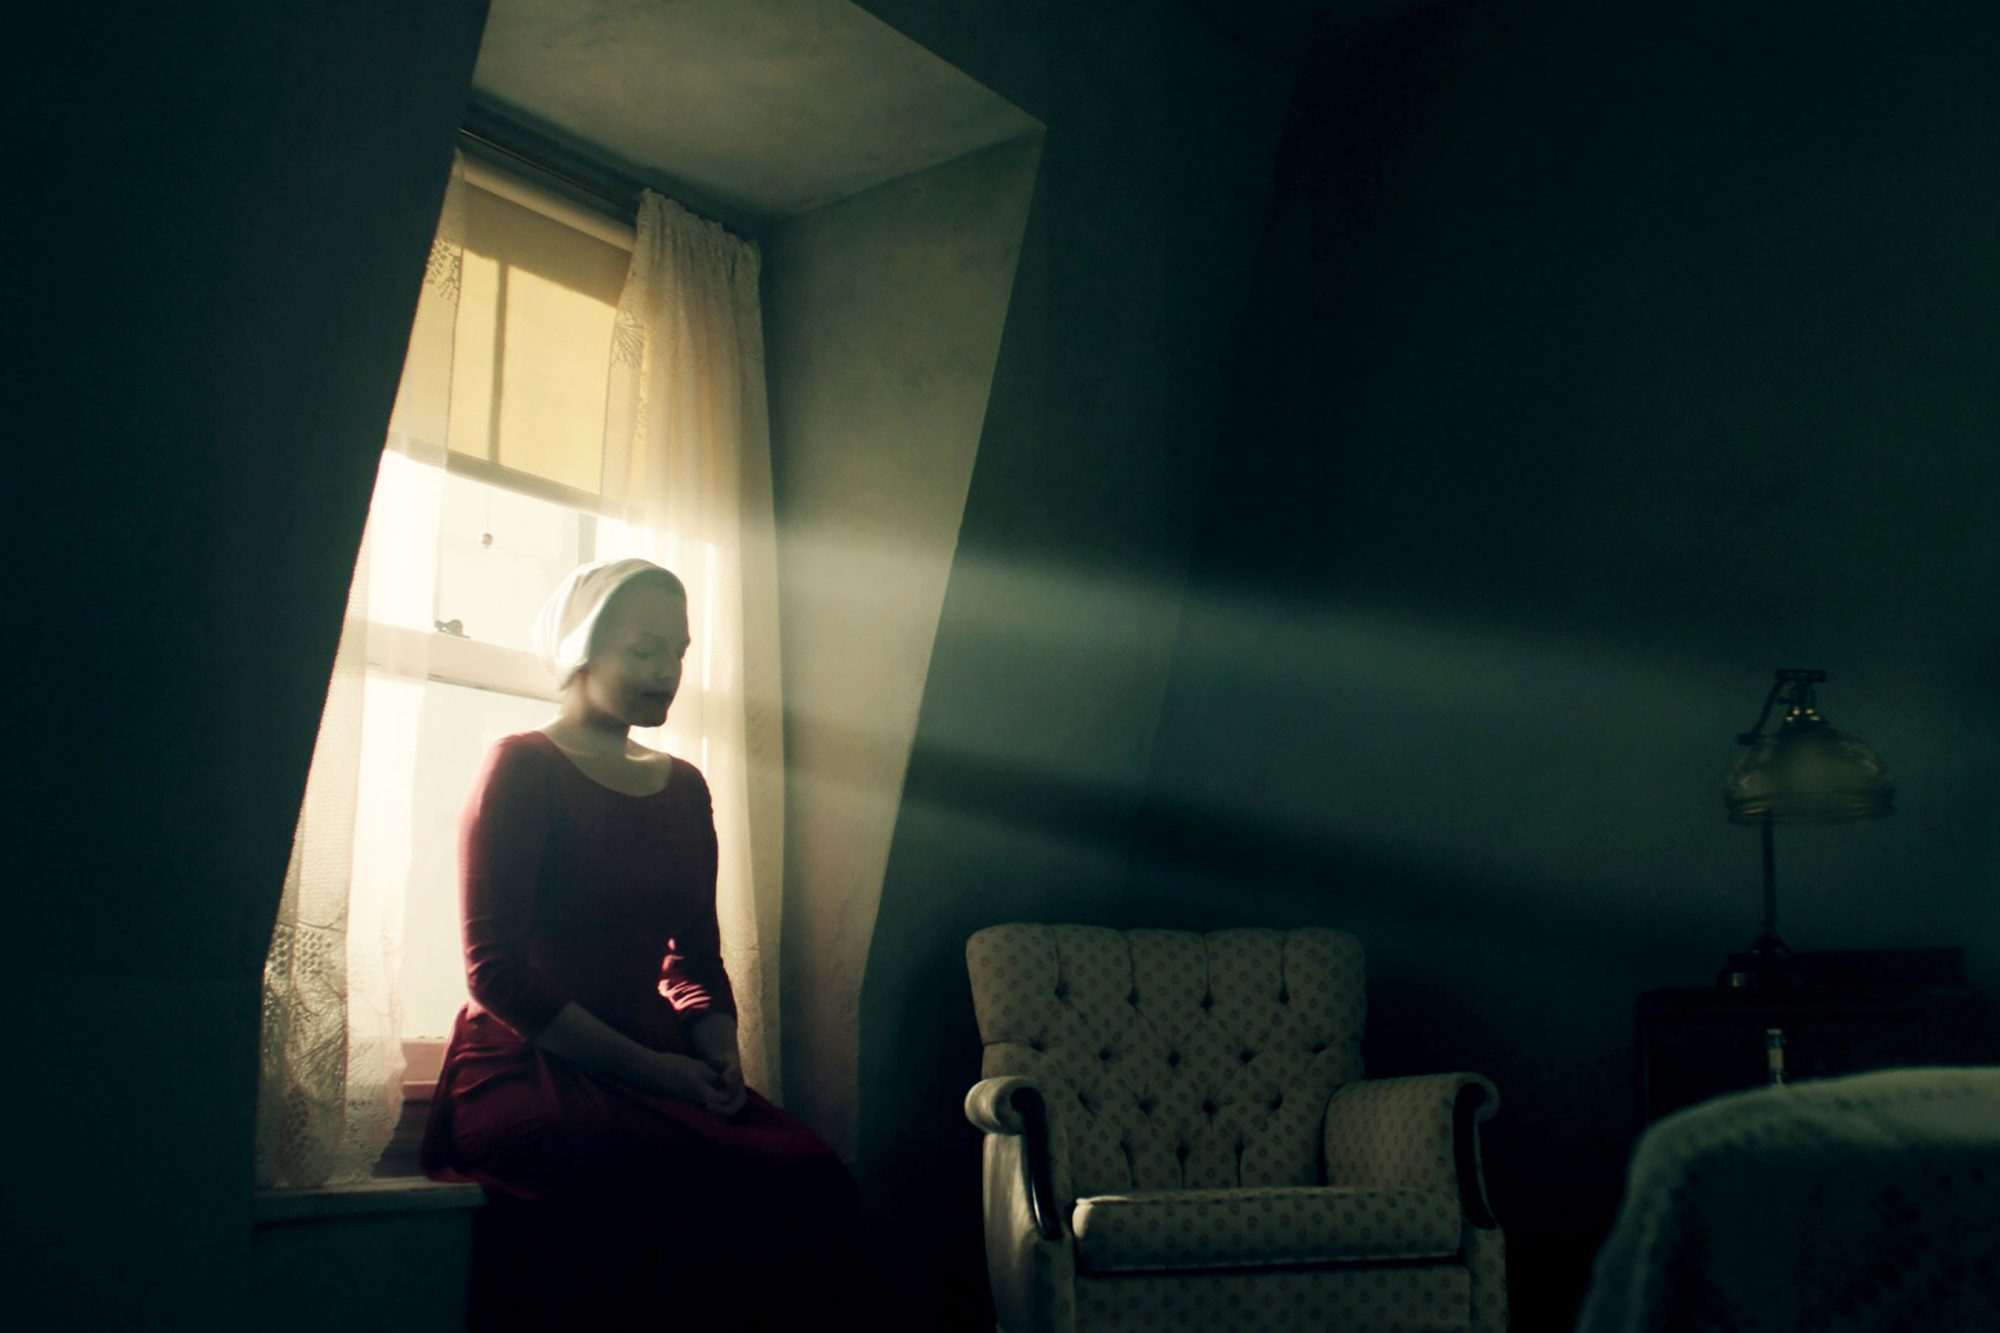 Handmaid's Tale First Look CR: Hulu